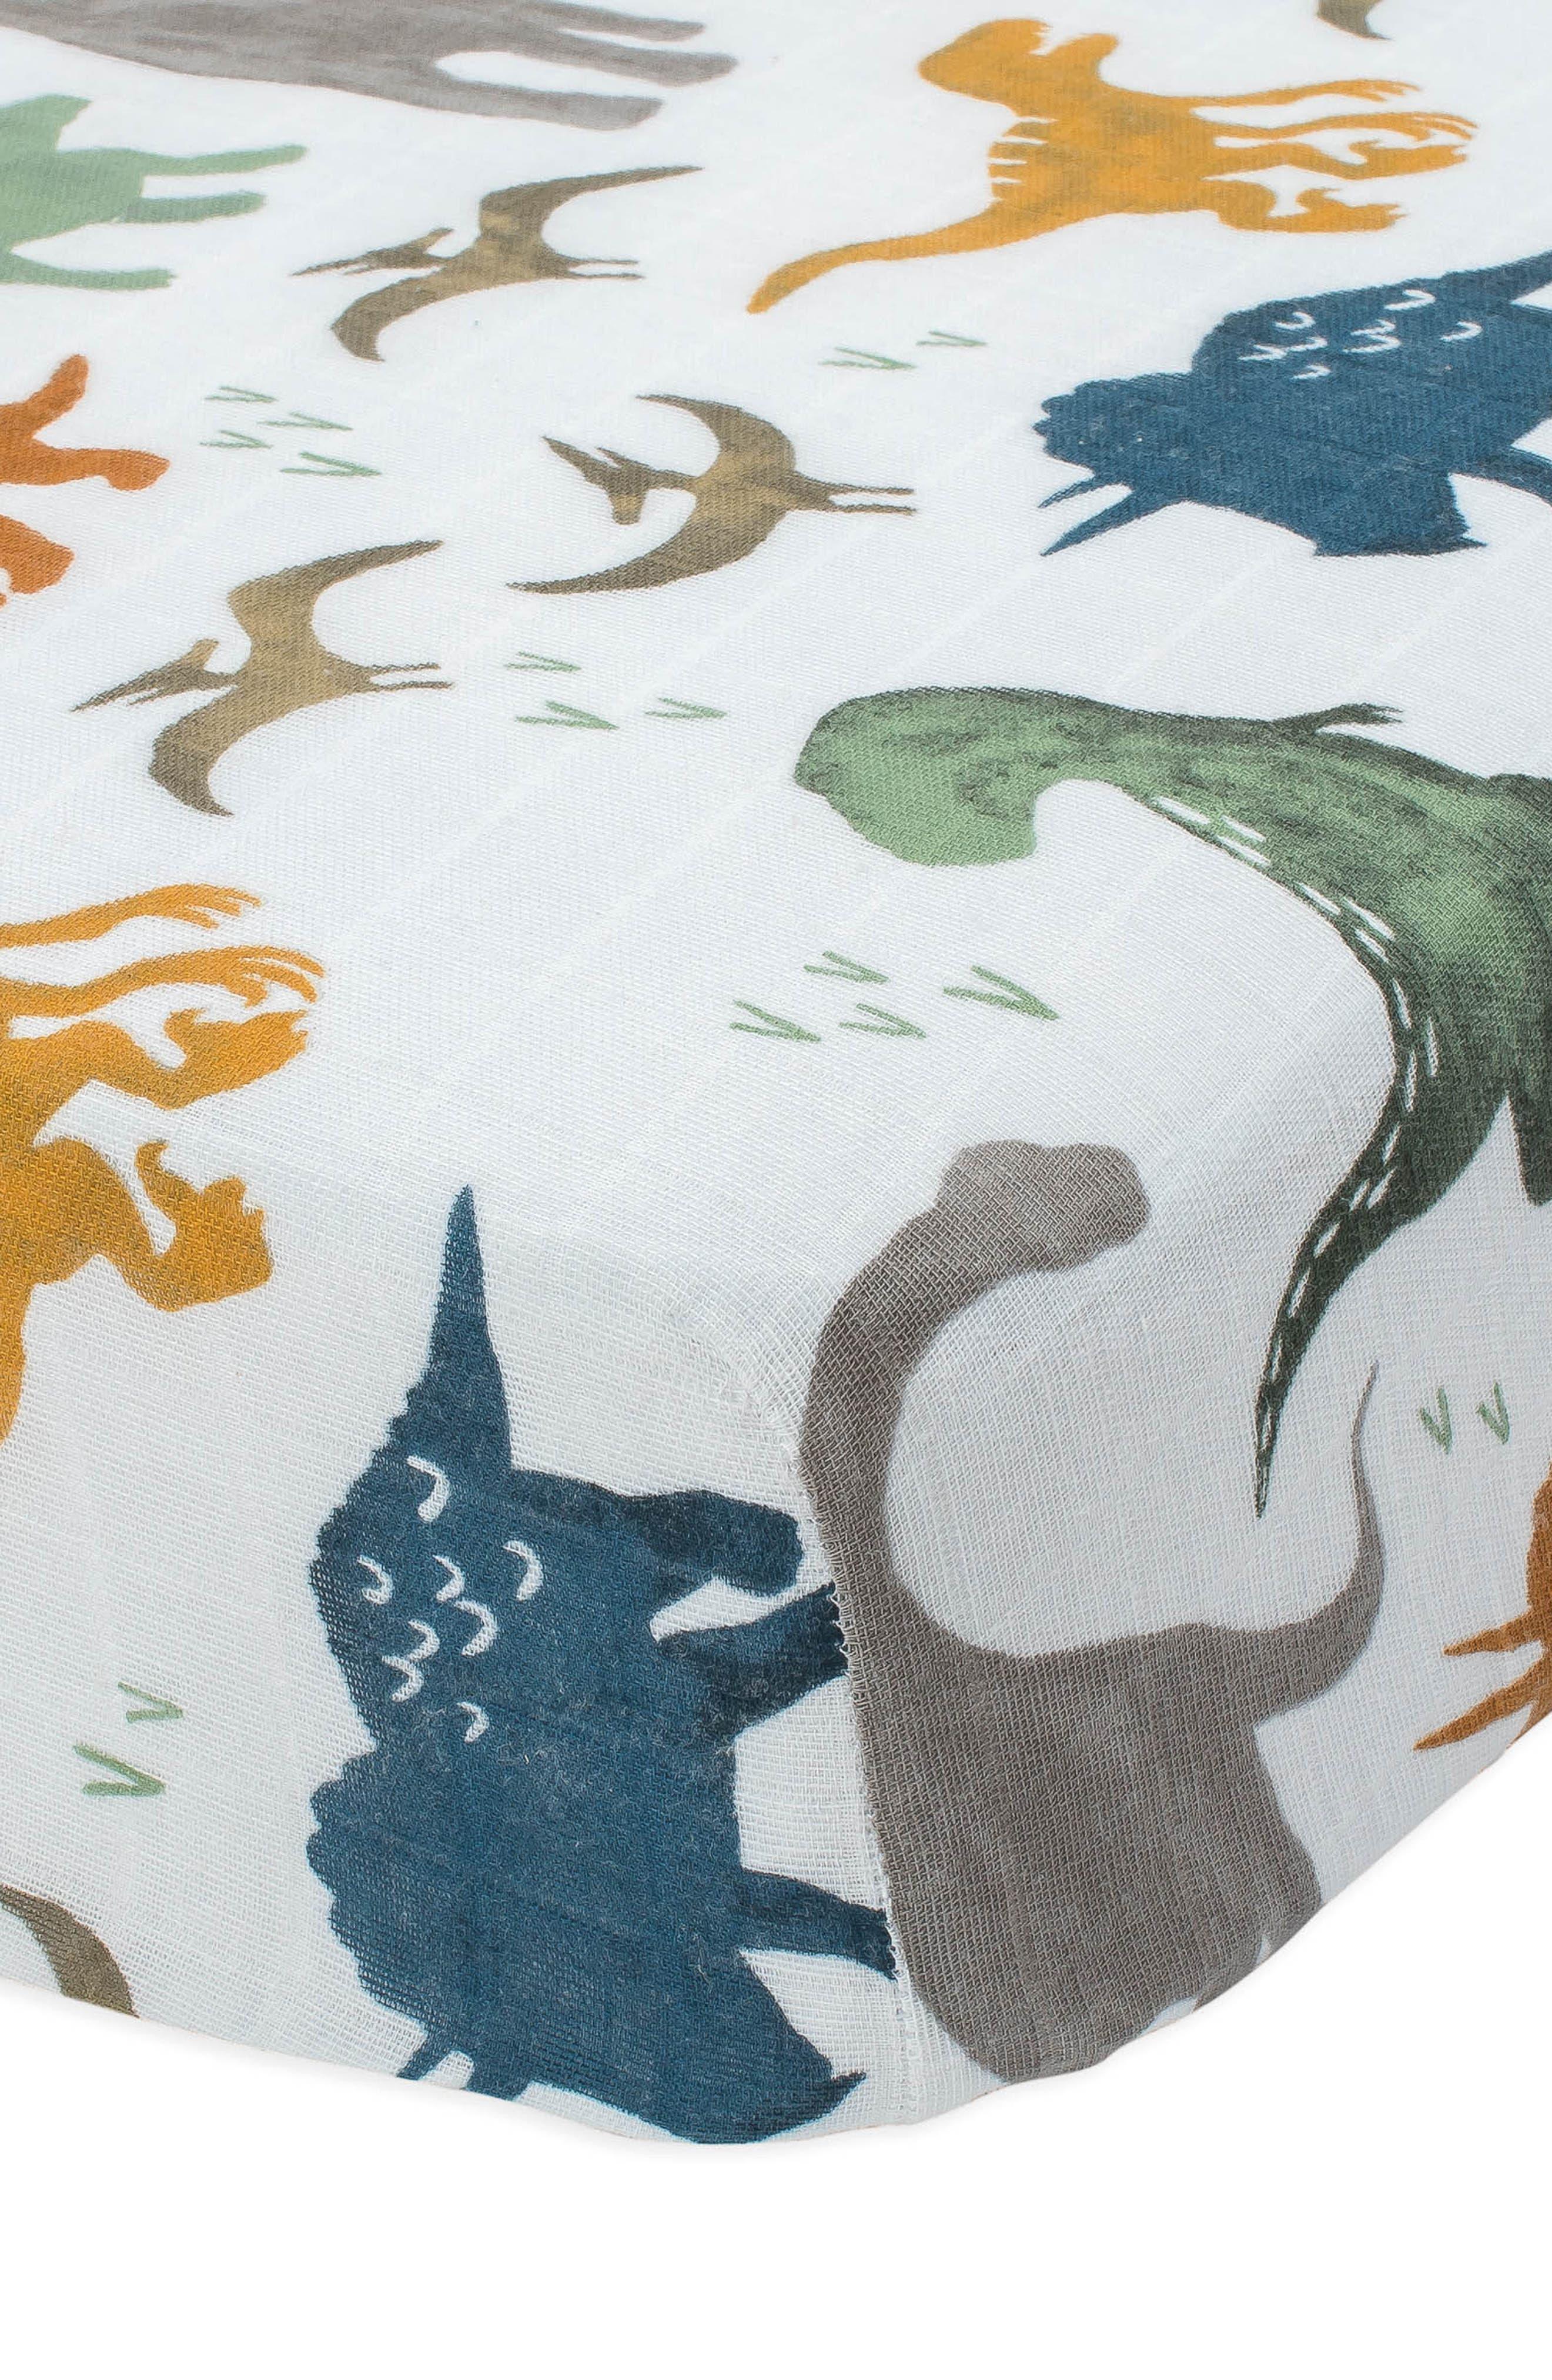 Cotton Muslin Crib Sheet,                             Alternate thumbnail 2, color,                             DINO FRIENDS